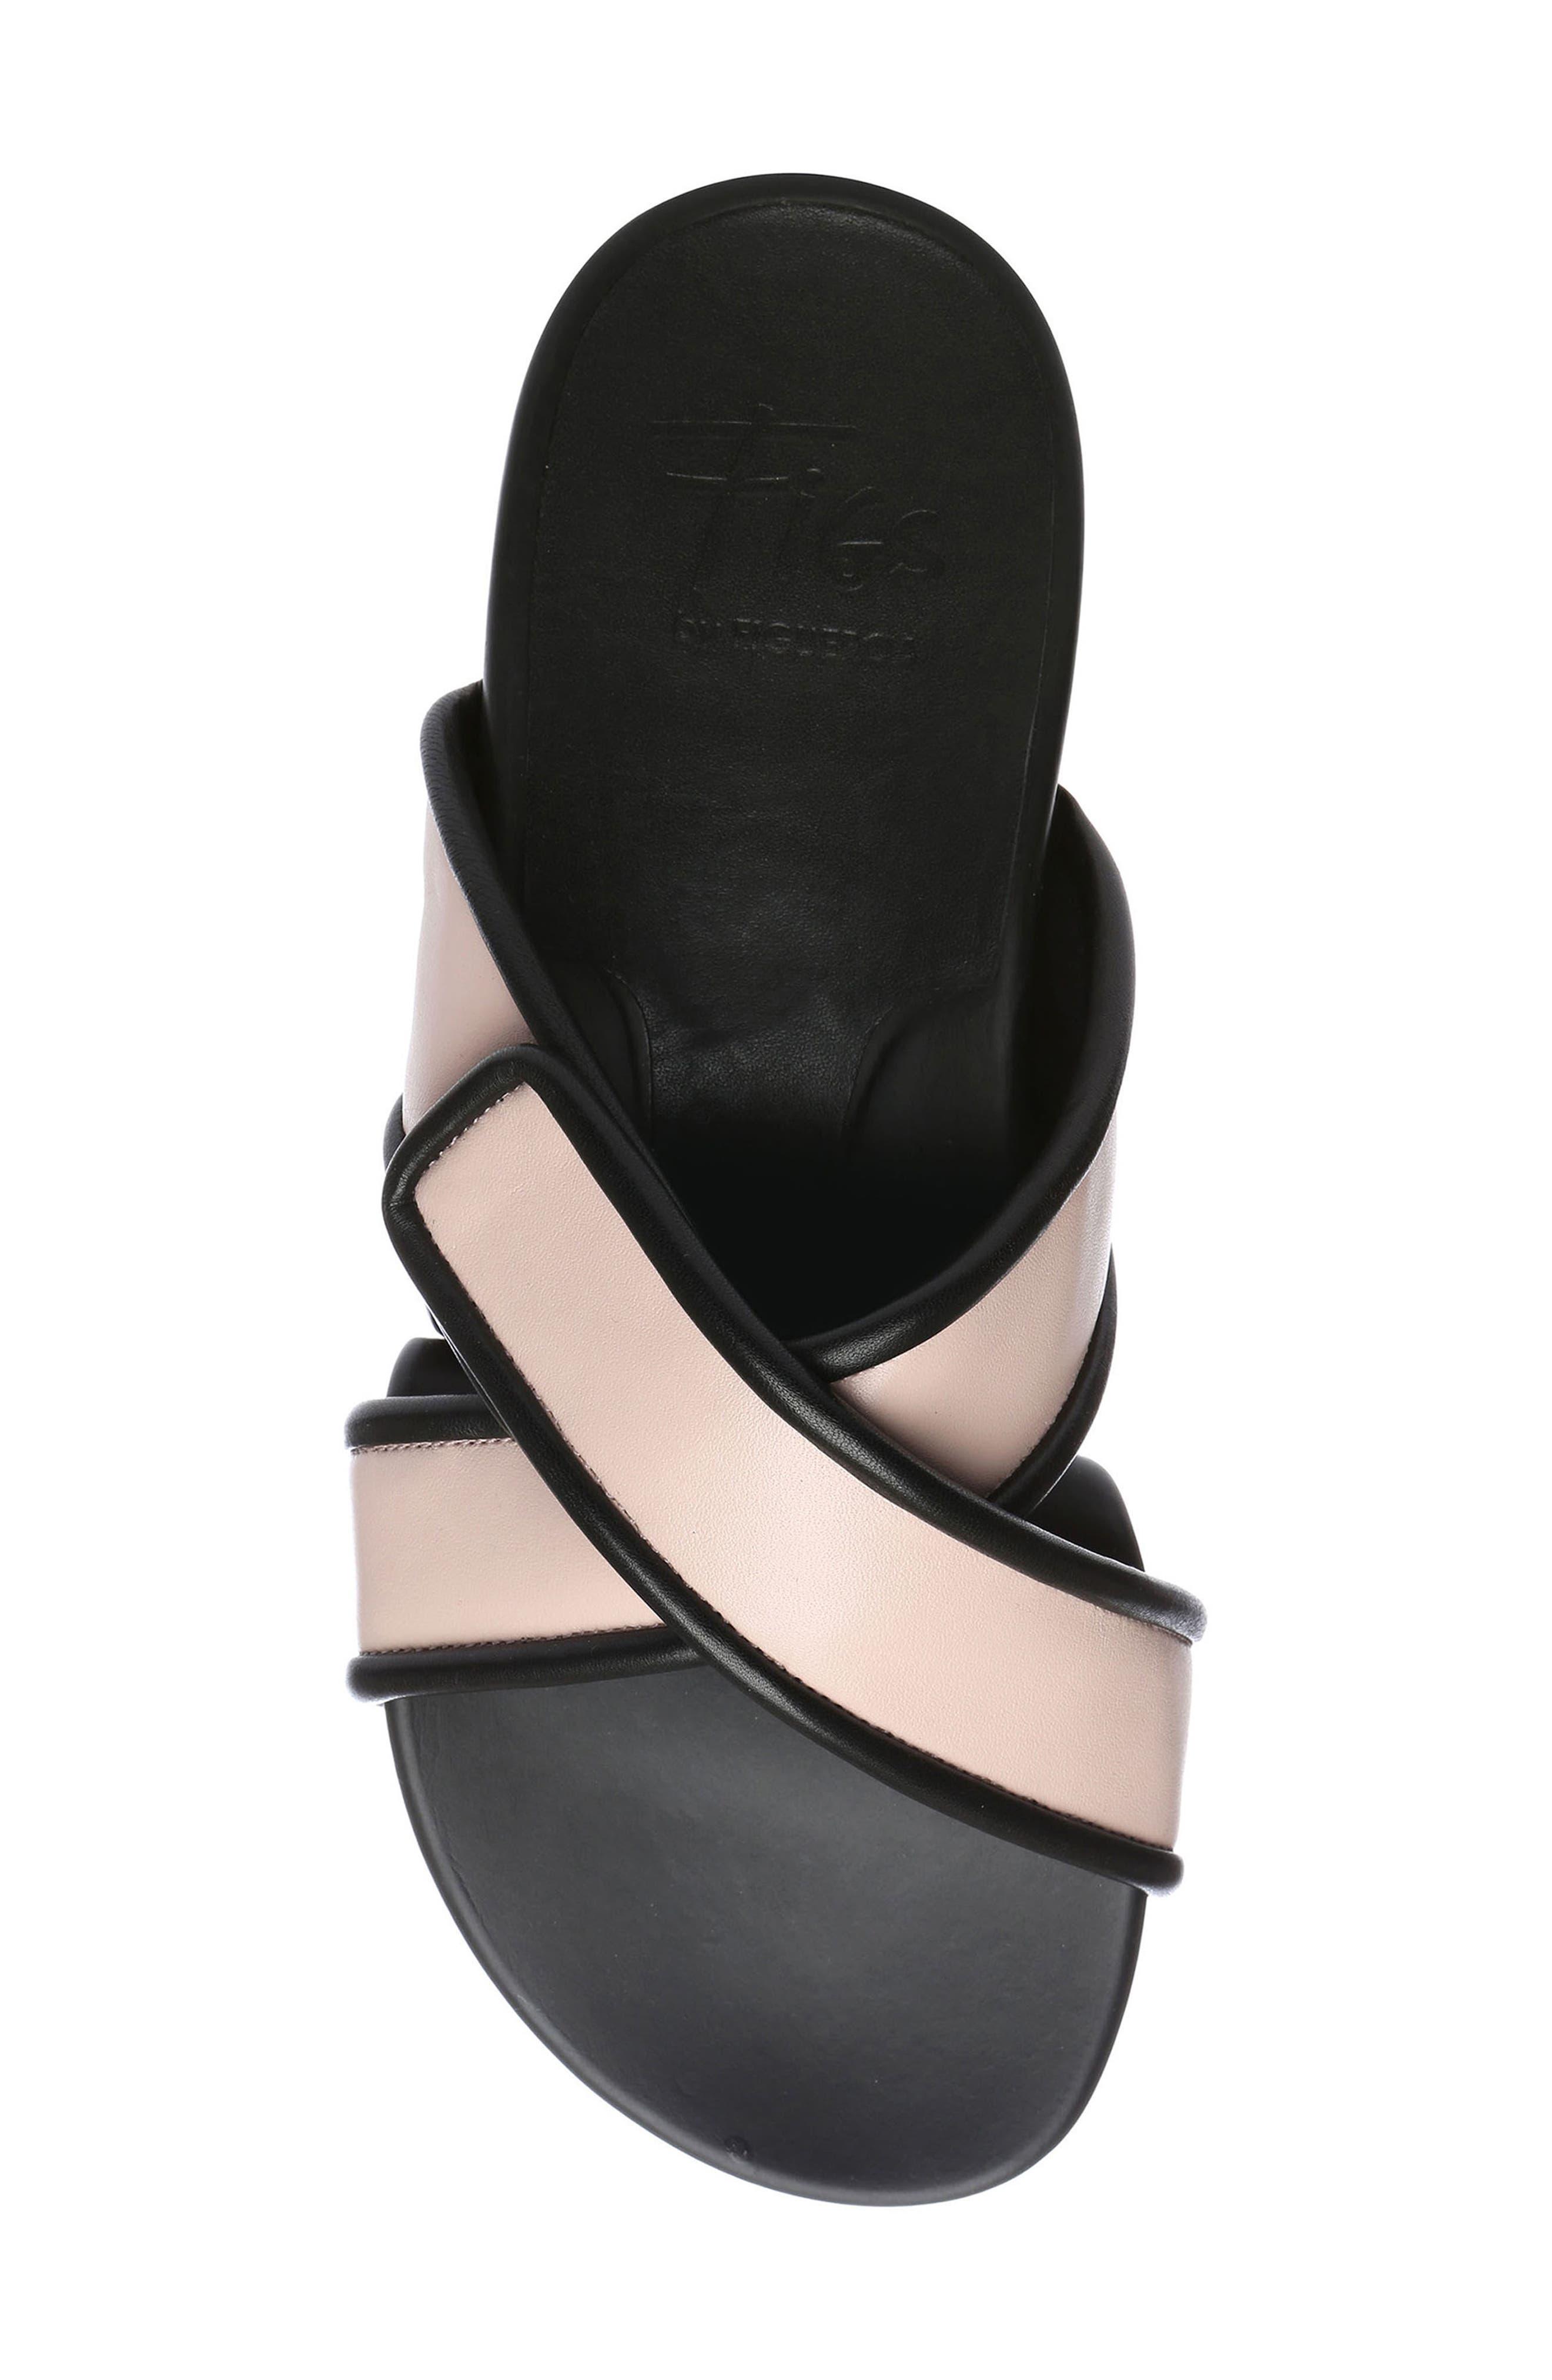 Figomatic Slide Sandal,                             Alternate thumbnail 4, color,                             Pink Nappa Leather